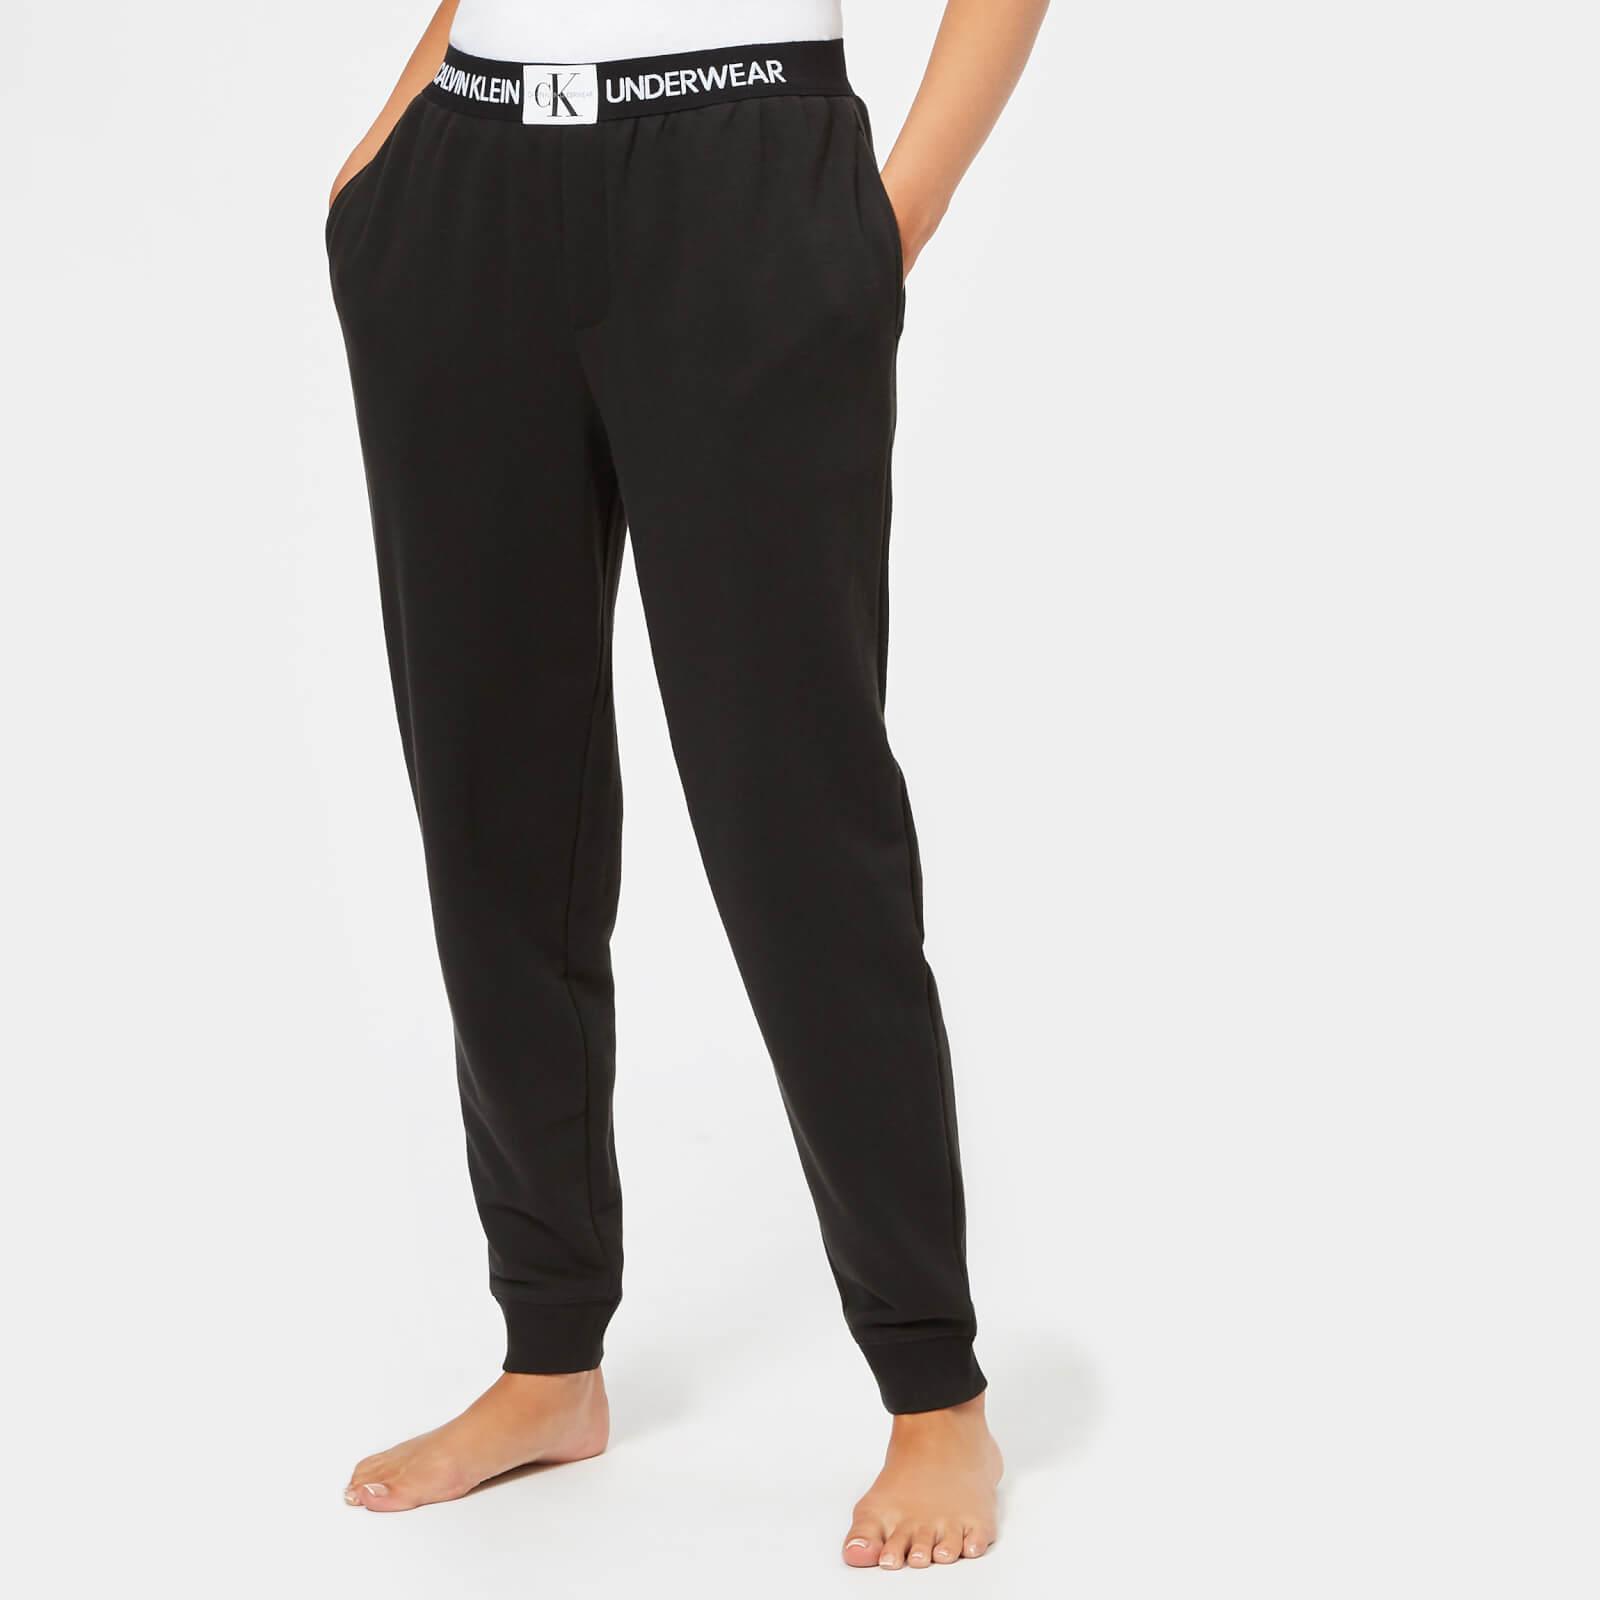 41815d24b8588 Calvin Klein Women's Monogram Joggers - Black - Free UK Delivery over £50